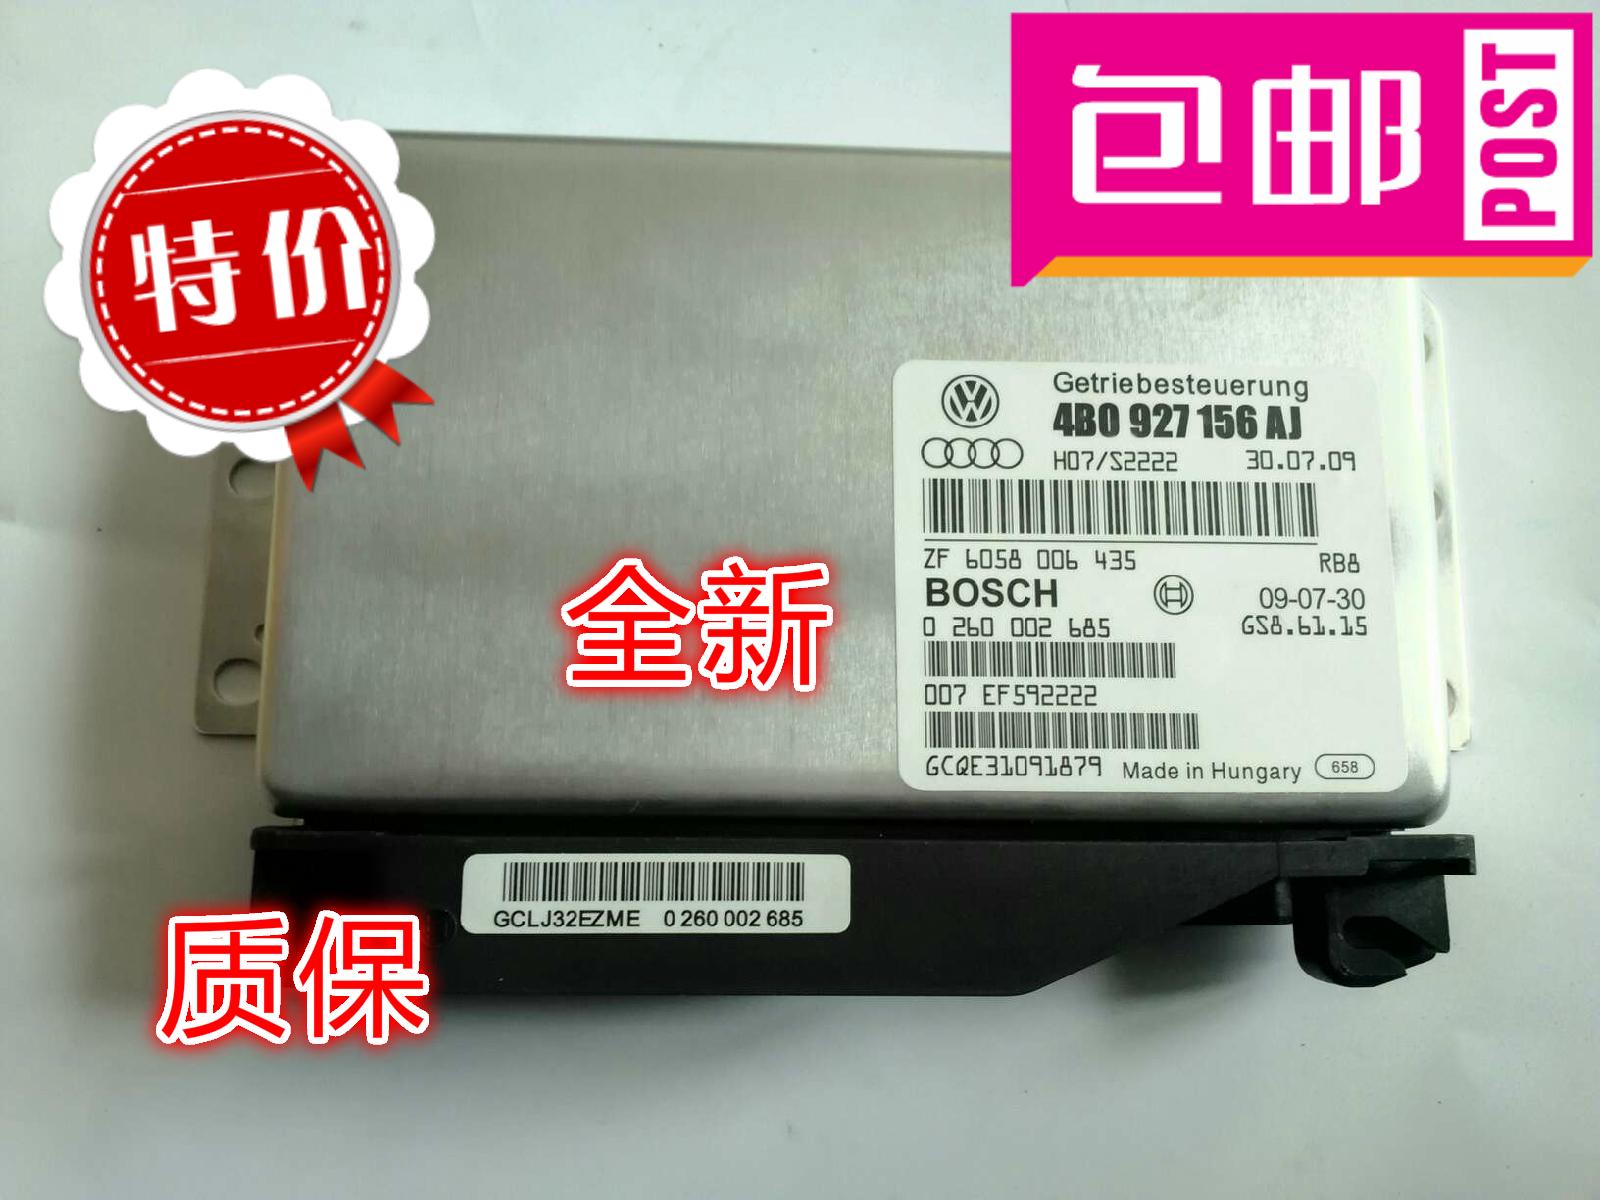 Автомобильный чип Passat b5 A6 B5 1.8T 01V 4/3B0927156 turbo k03 53039700029 53039880029 058145703j n058145703c for audi a4 a6 vw passat variant 1 8t amg awm atw aug bfb apu aeb 1 8l